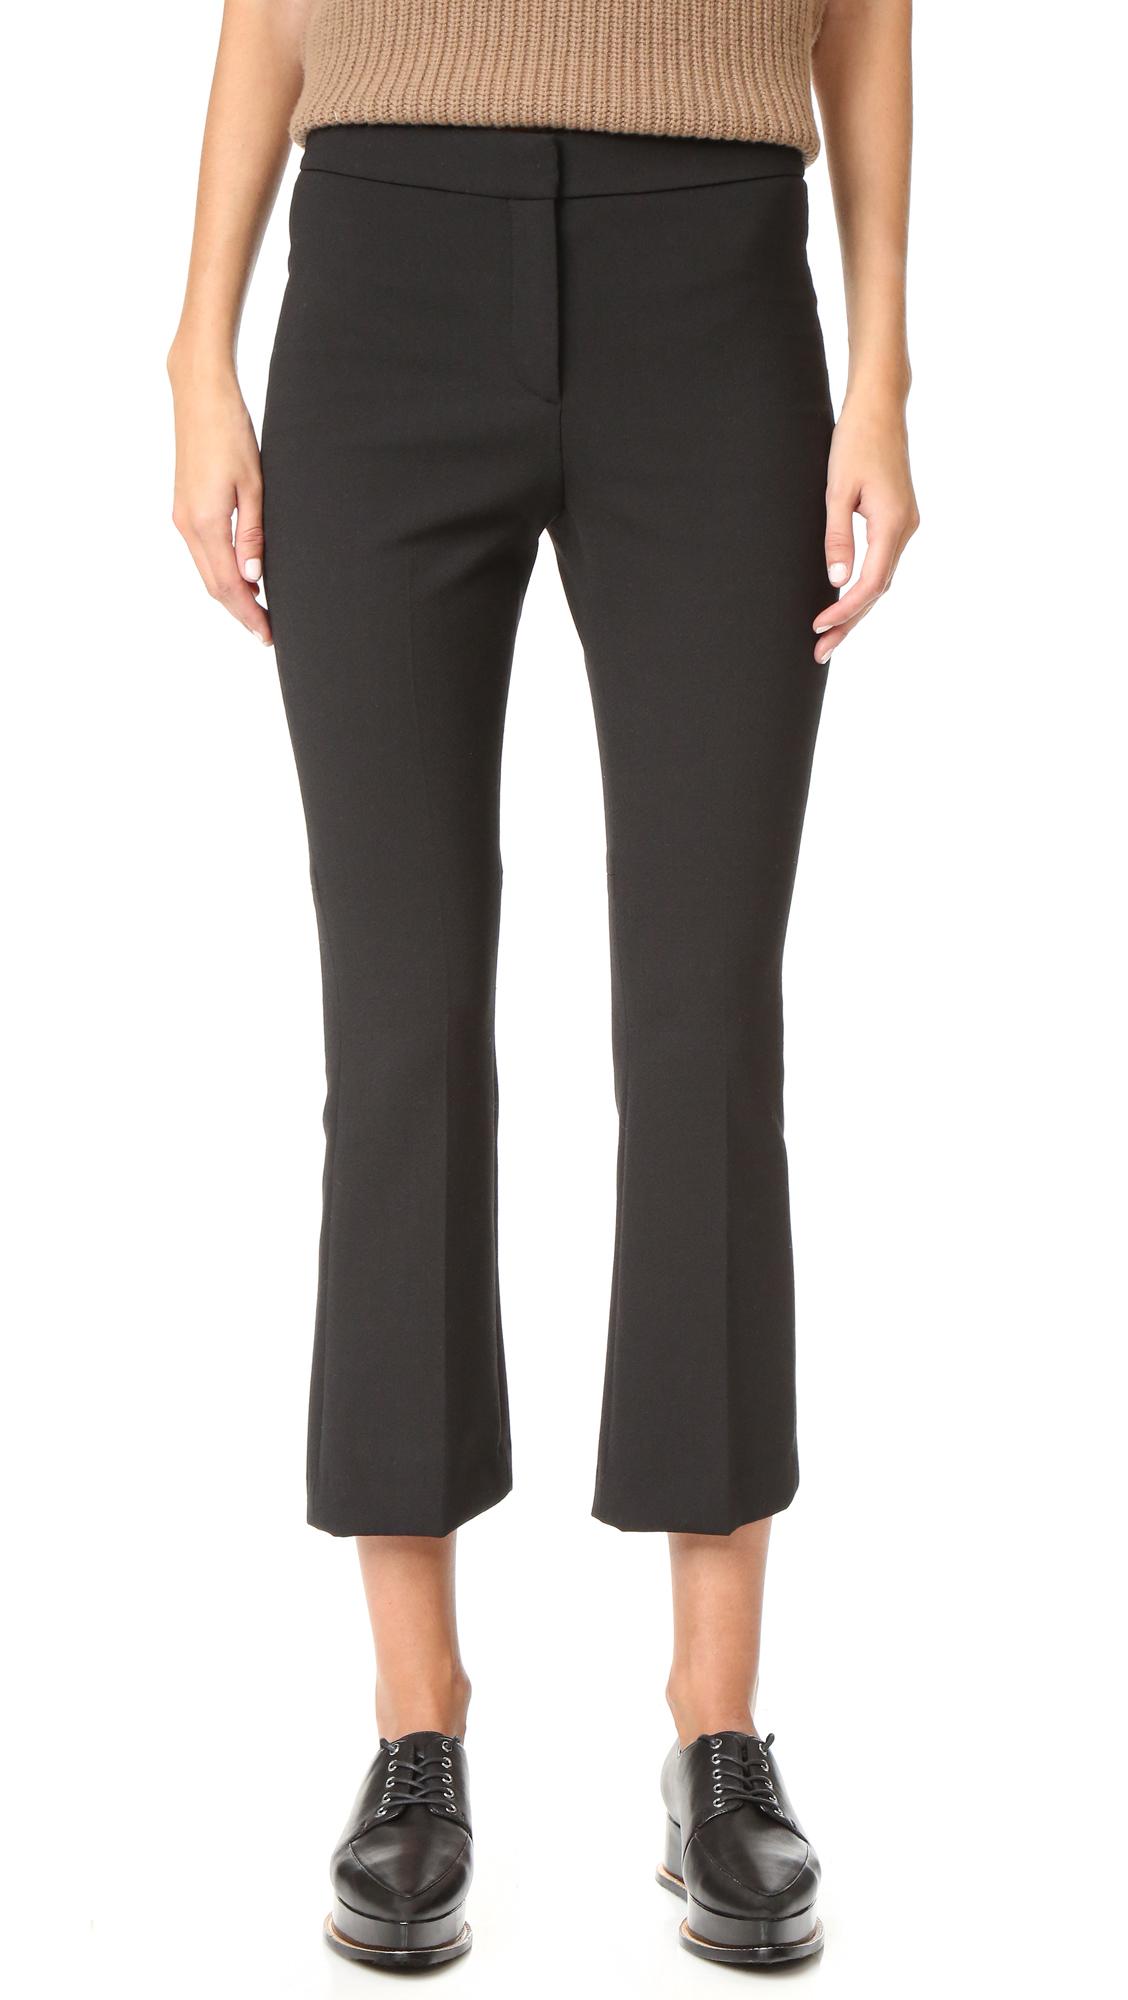 Theory Erstina Cropped Flare Pants - Black at Shopbop